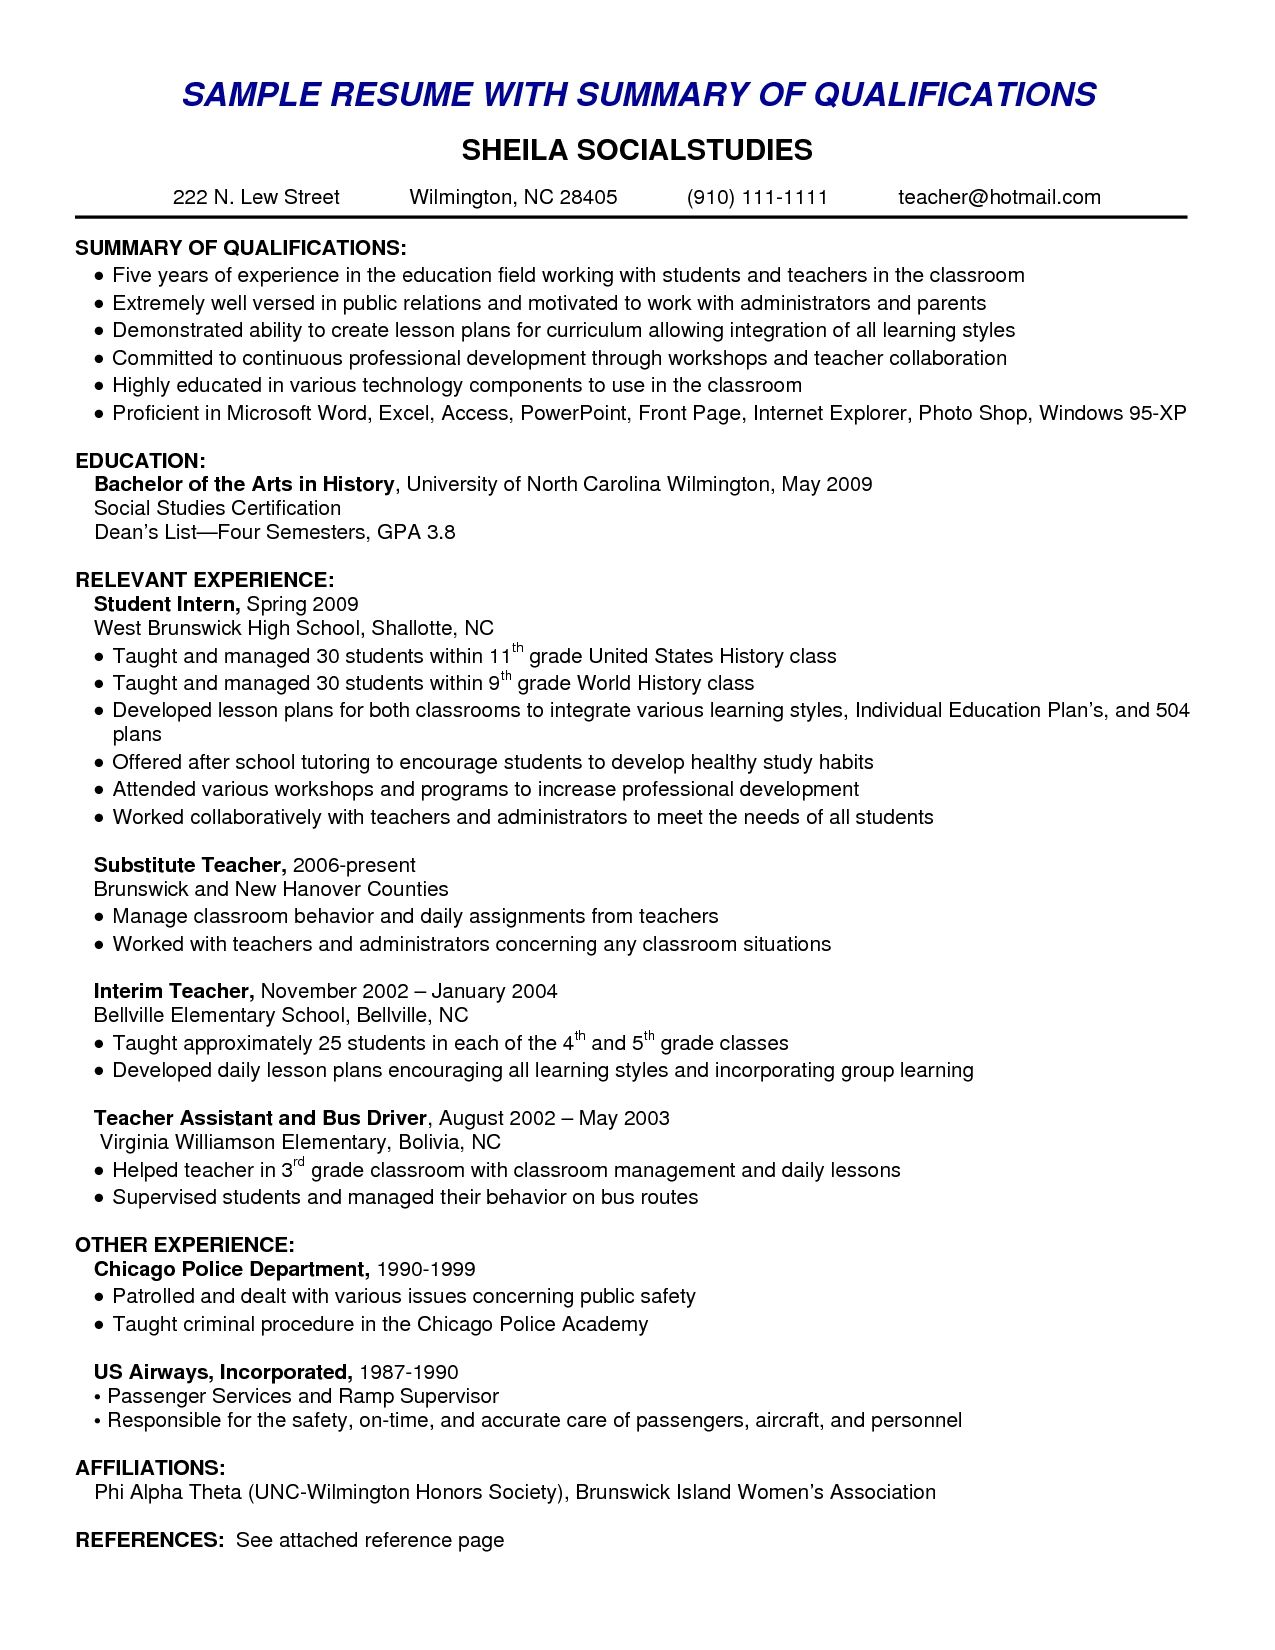 Resume Skills Summary Examples Example Of Skills Summary For Resume Amusing  Summary Of Skills